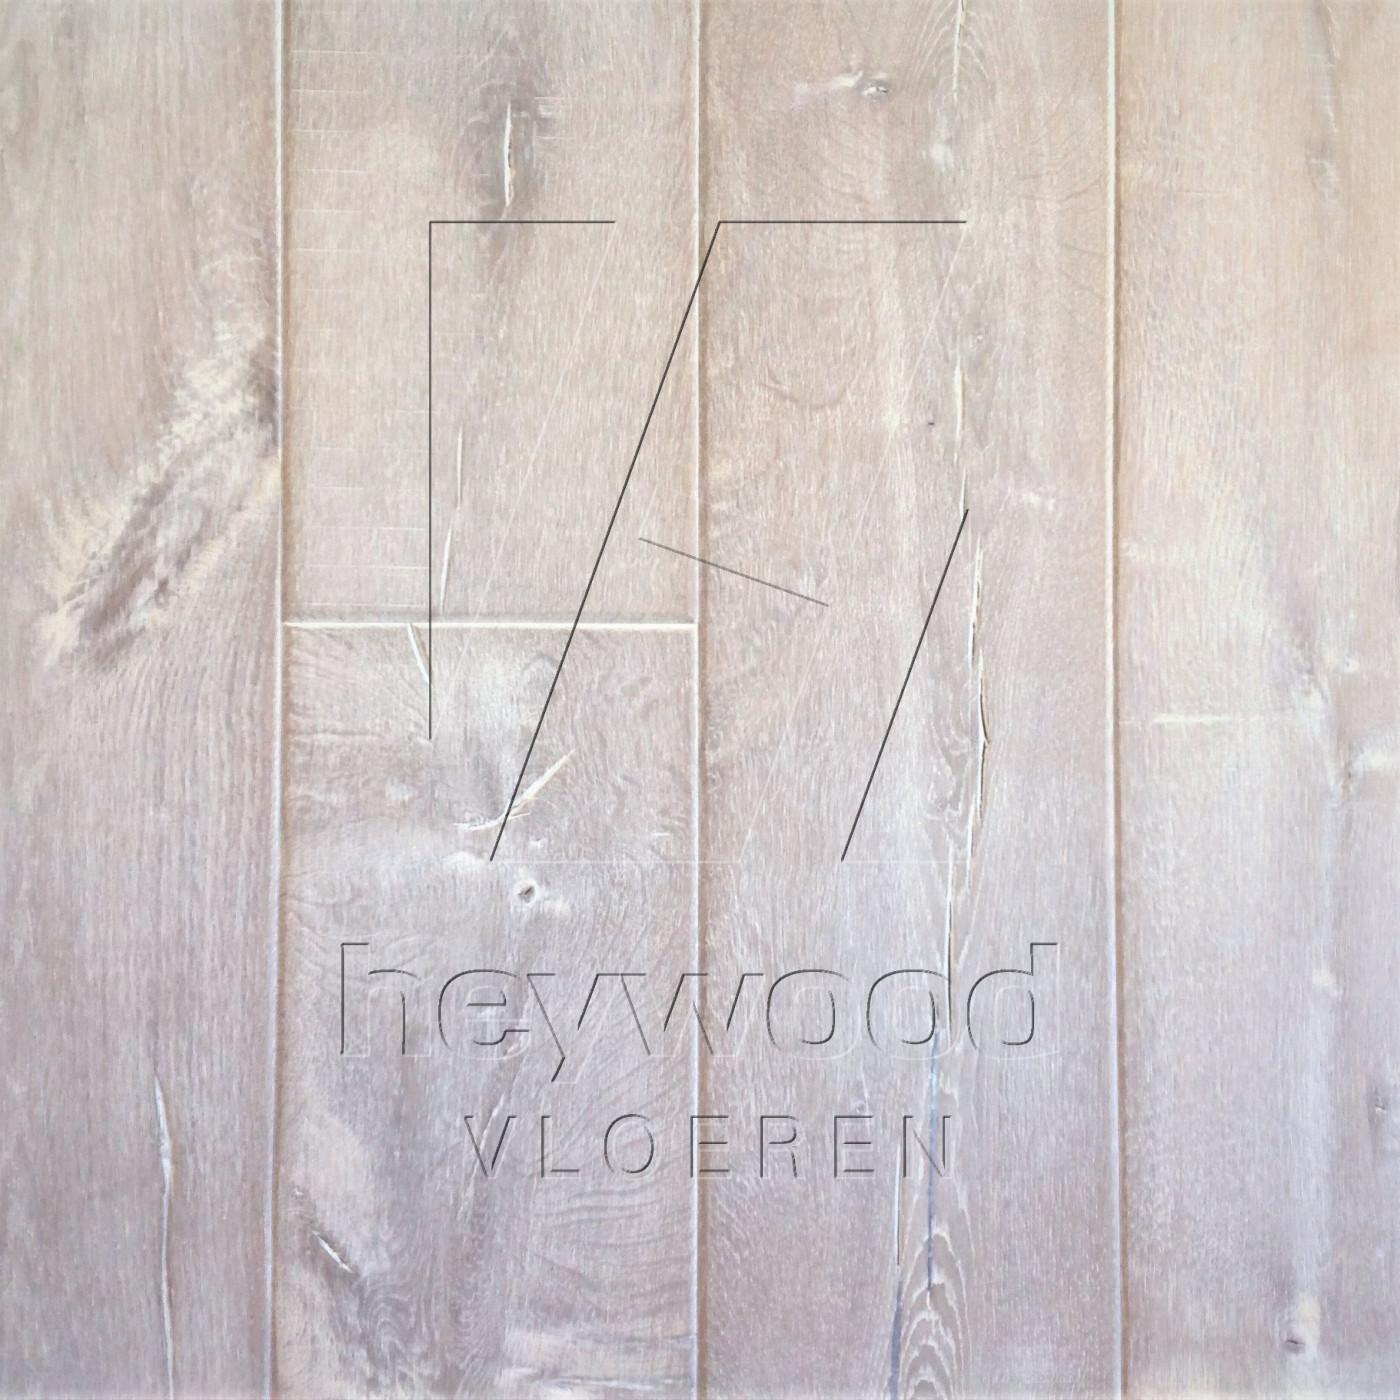 Shrunk Plank 'Svalbard' in Aged Shrunk surface of Aged Hardwood Floors